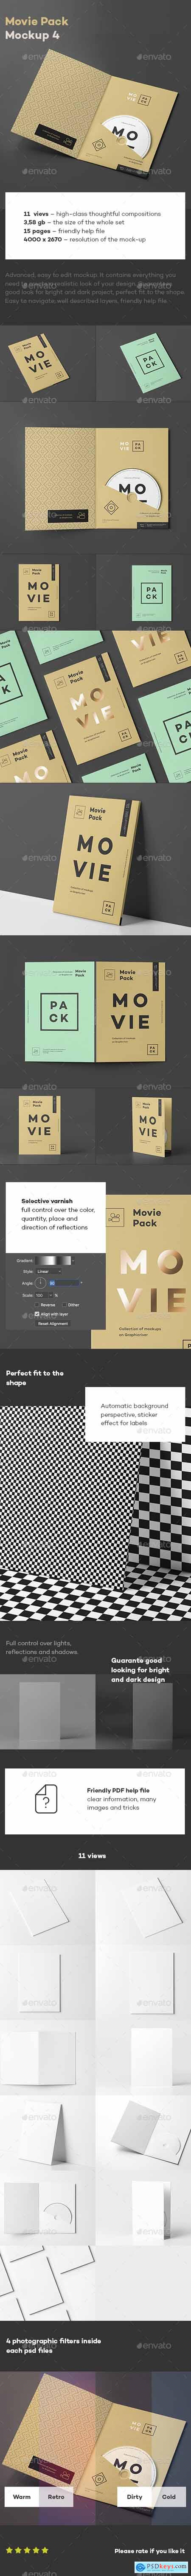 Movie Pack Mock-up 4 24379882